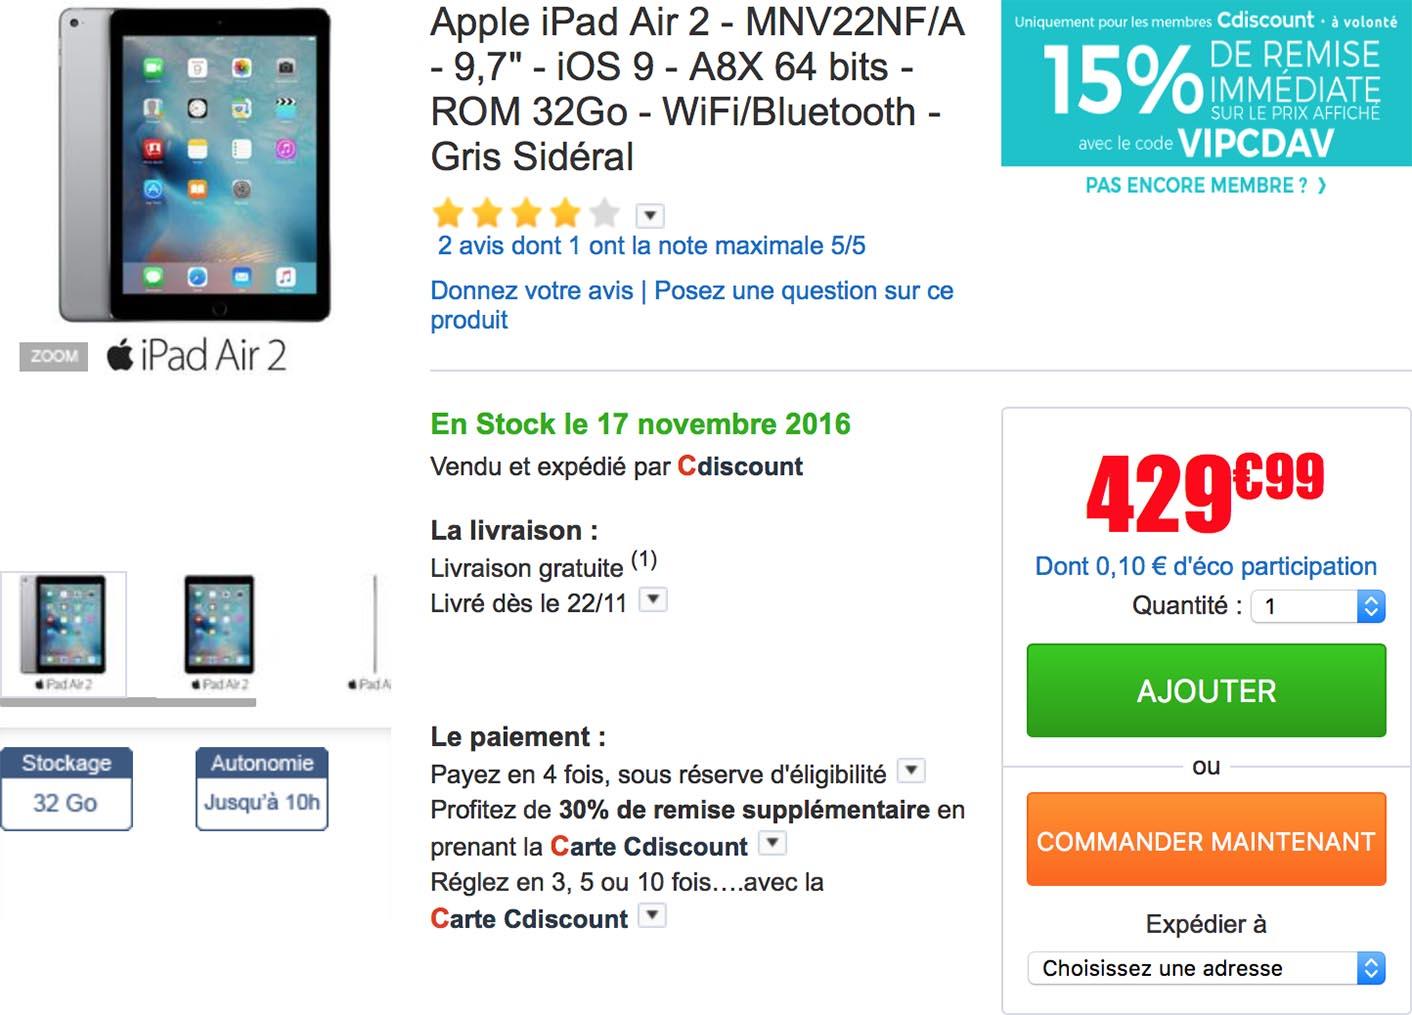 iPad Air 2 CDiscount